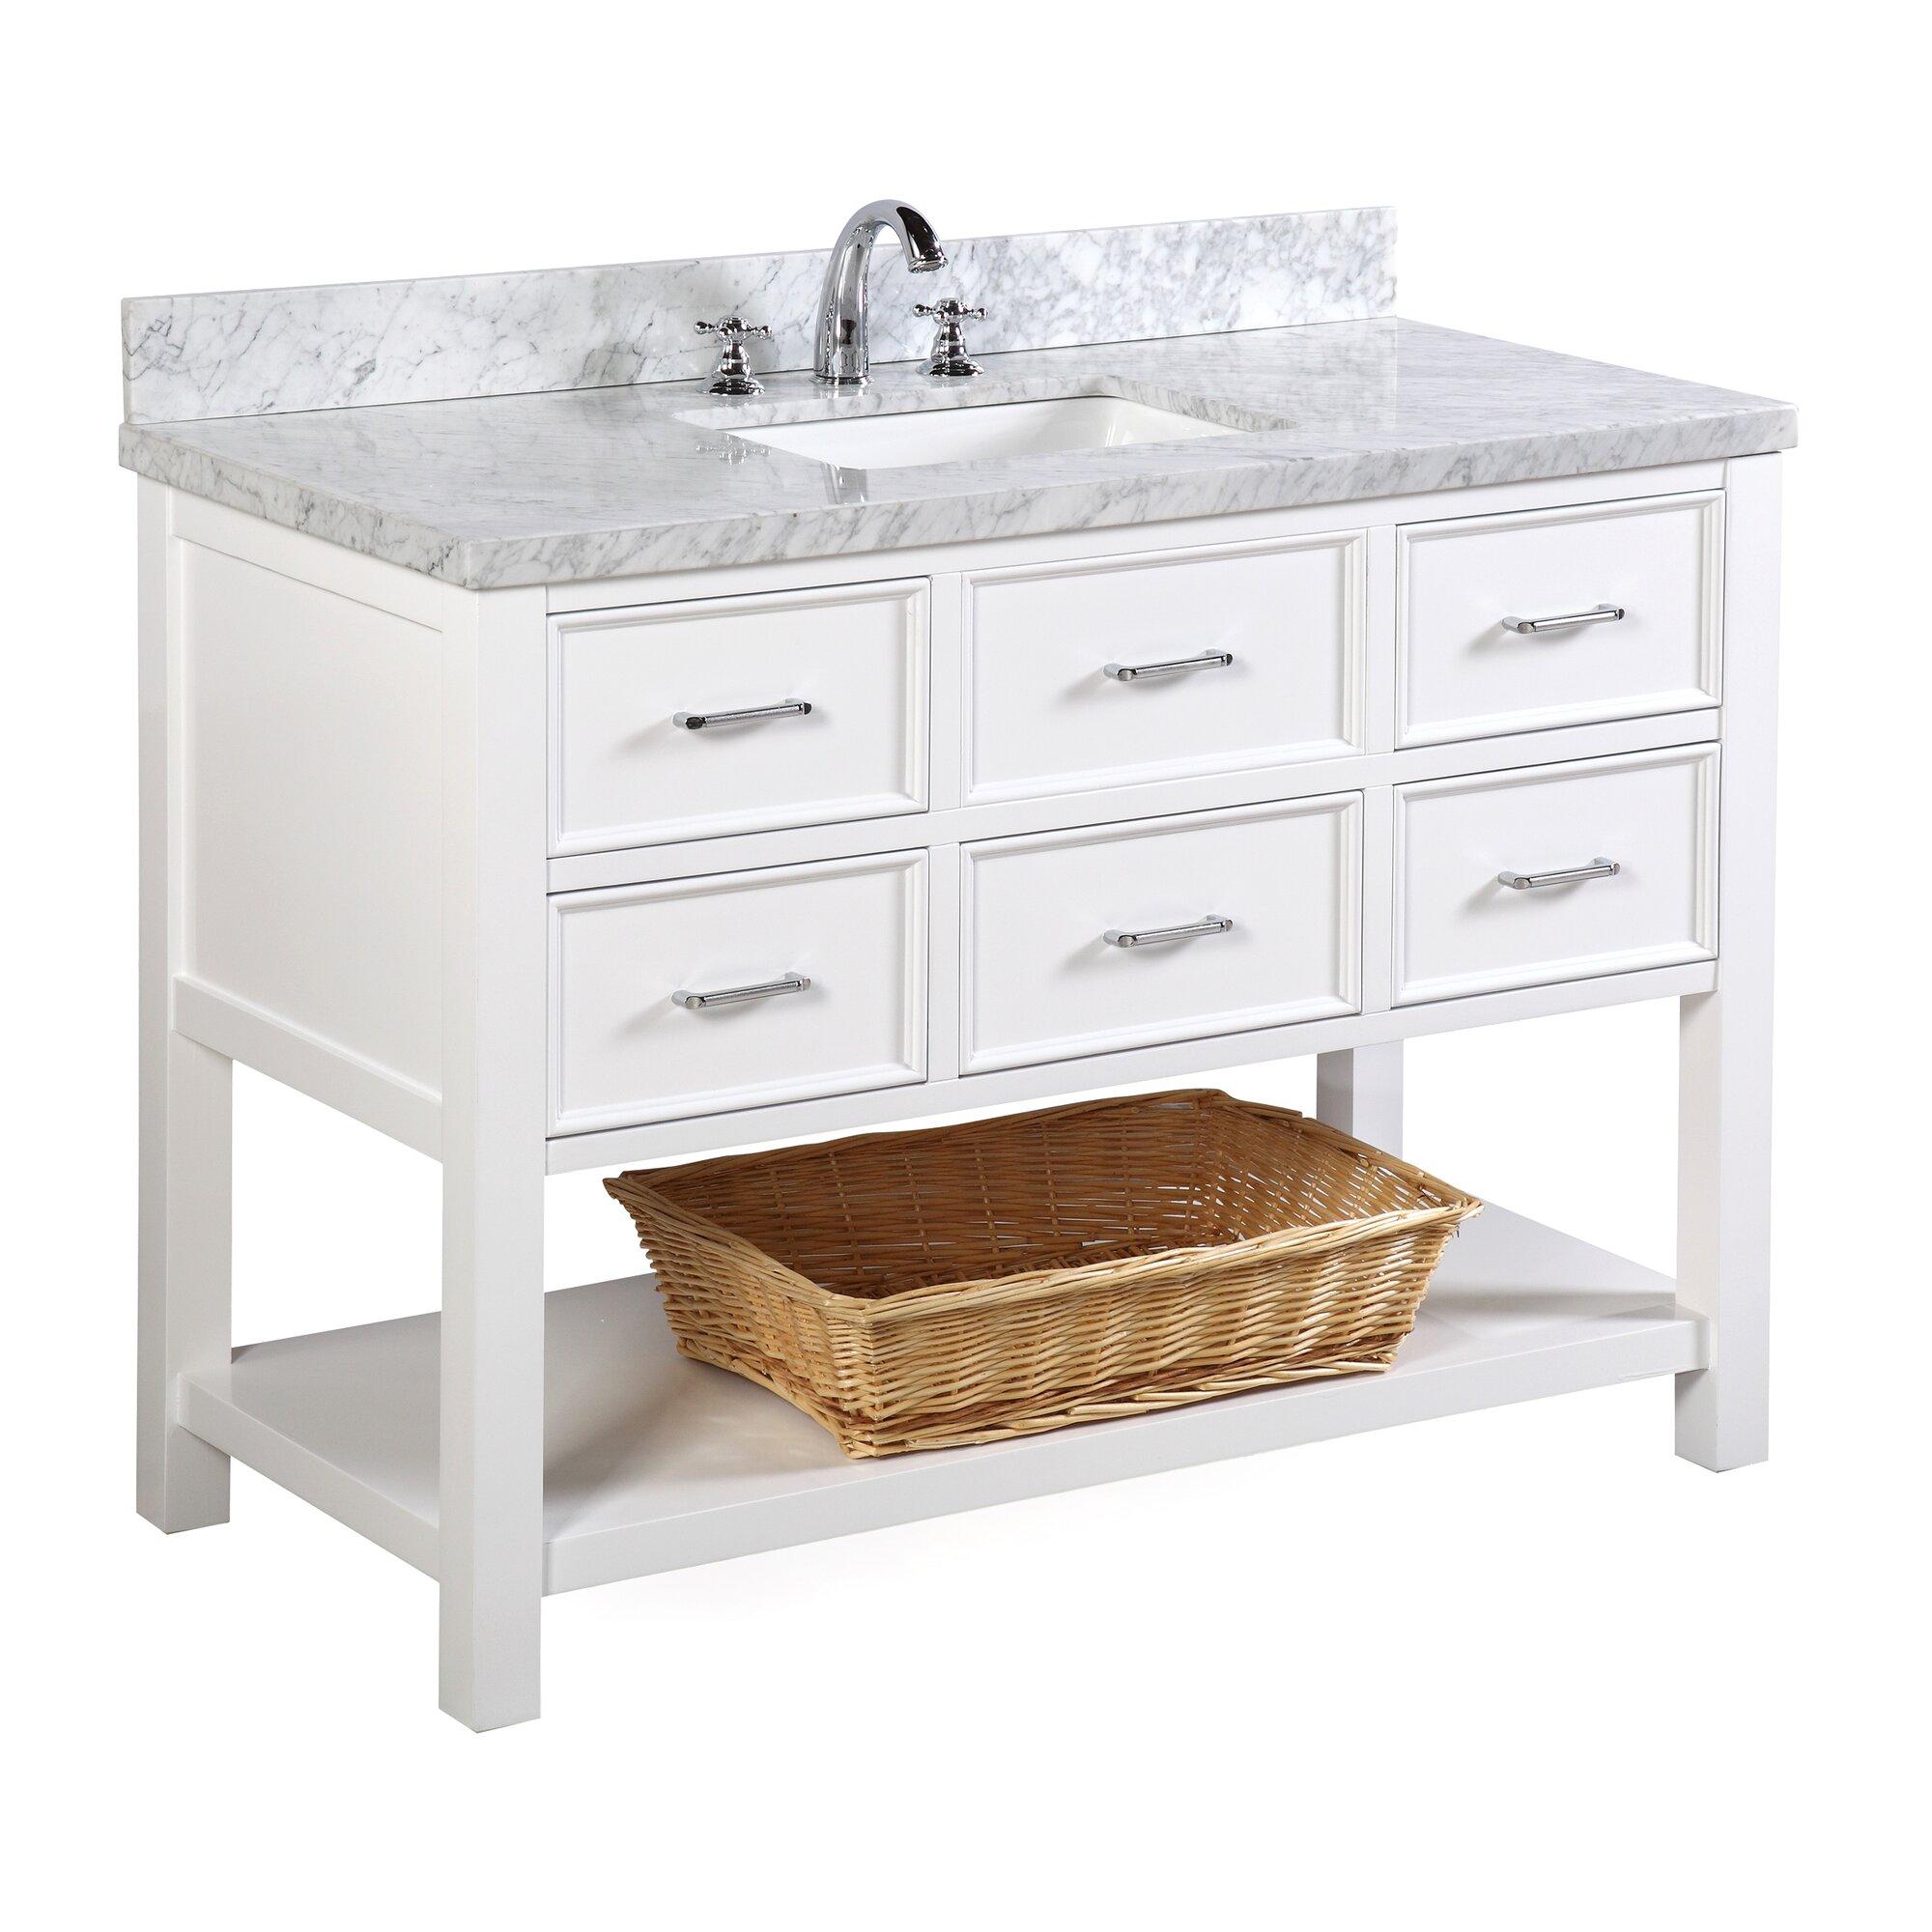 Wayfair bathroom cabinets - New Hampshire 48 Single Bathroom Vanity Set